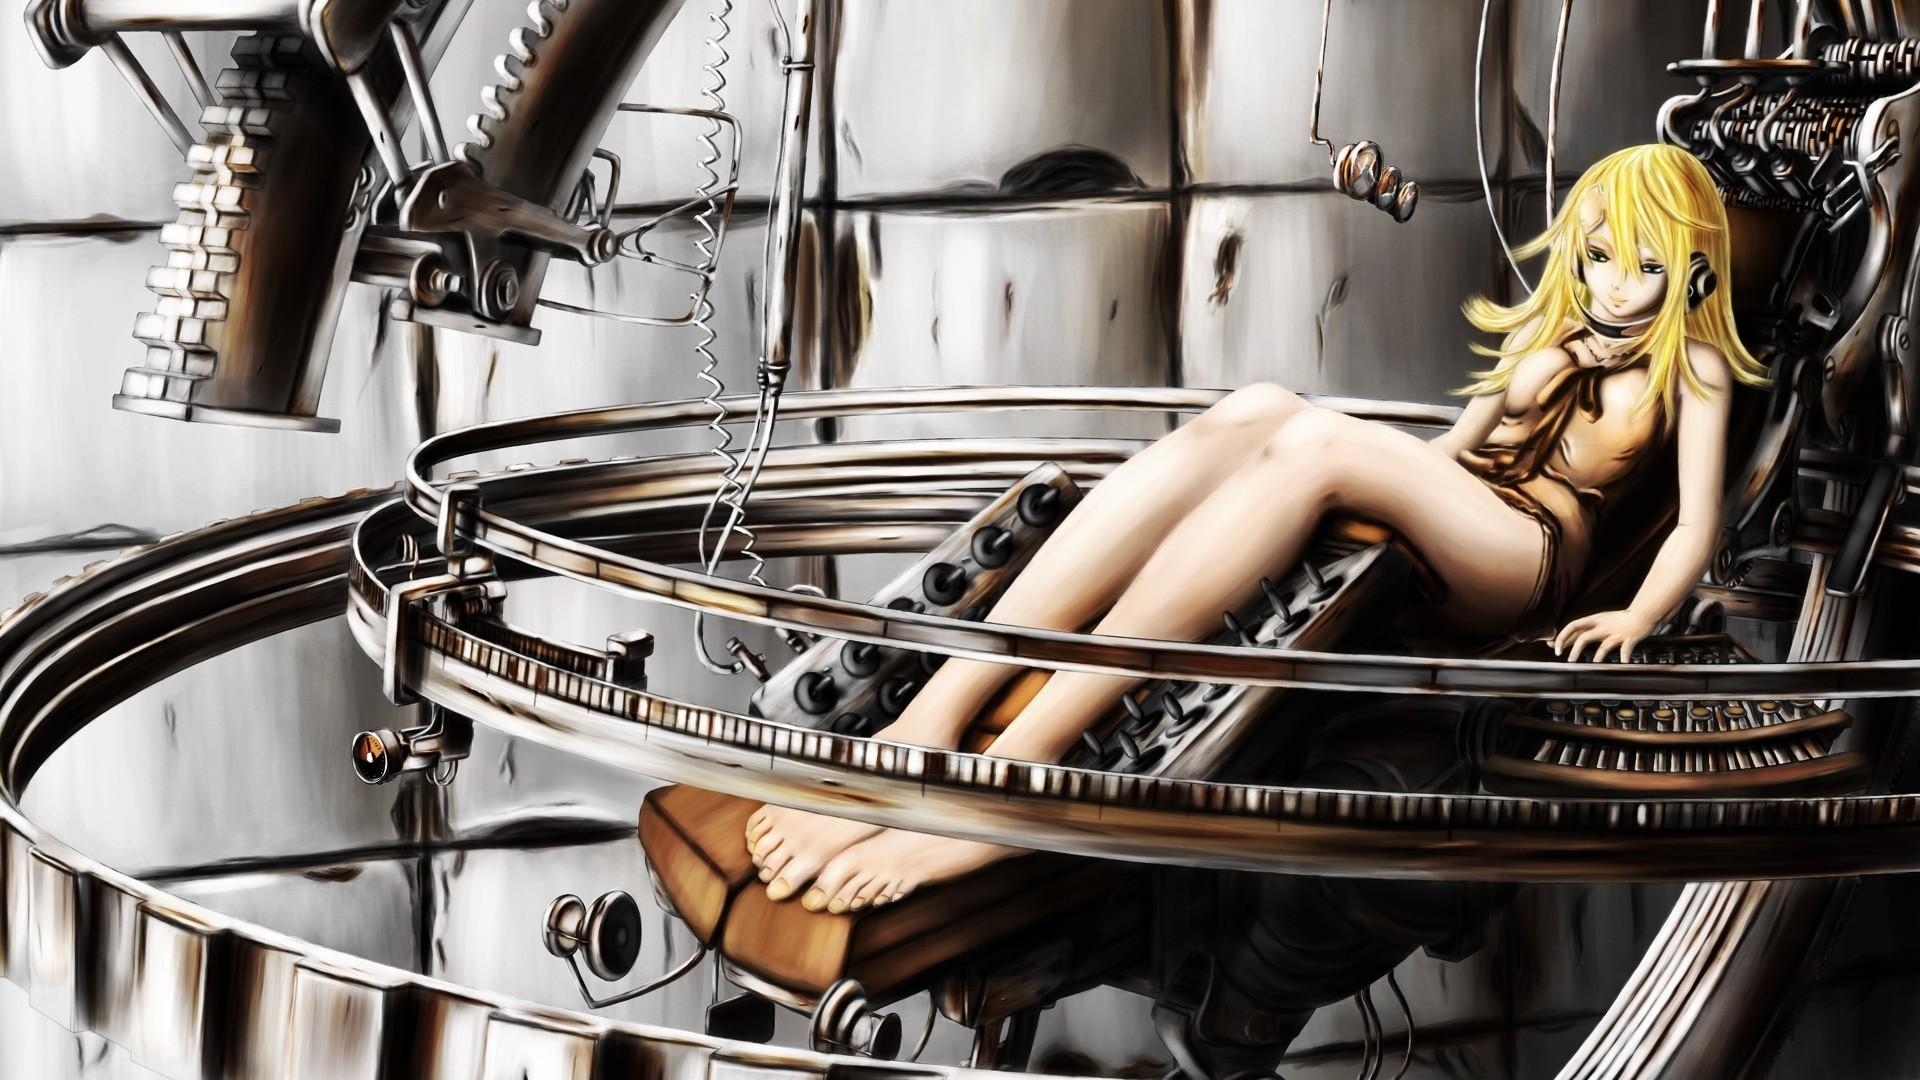 wallpaper blonde anime girls drums air gear sumeragi kururu skin head percussion. Black Bedroom Furniture Sets. Home Design Ideas